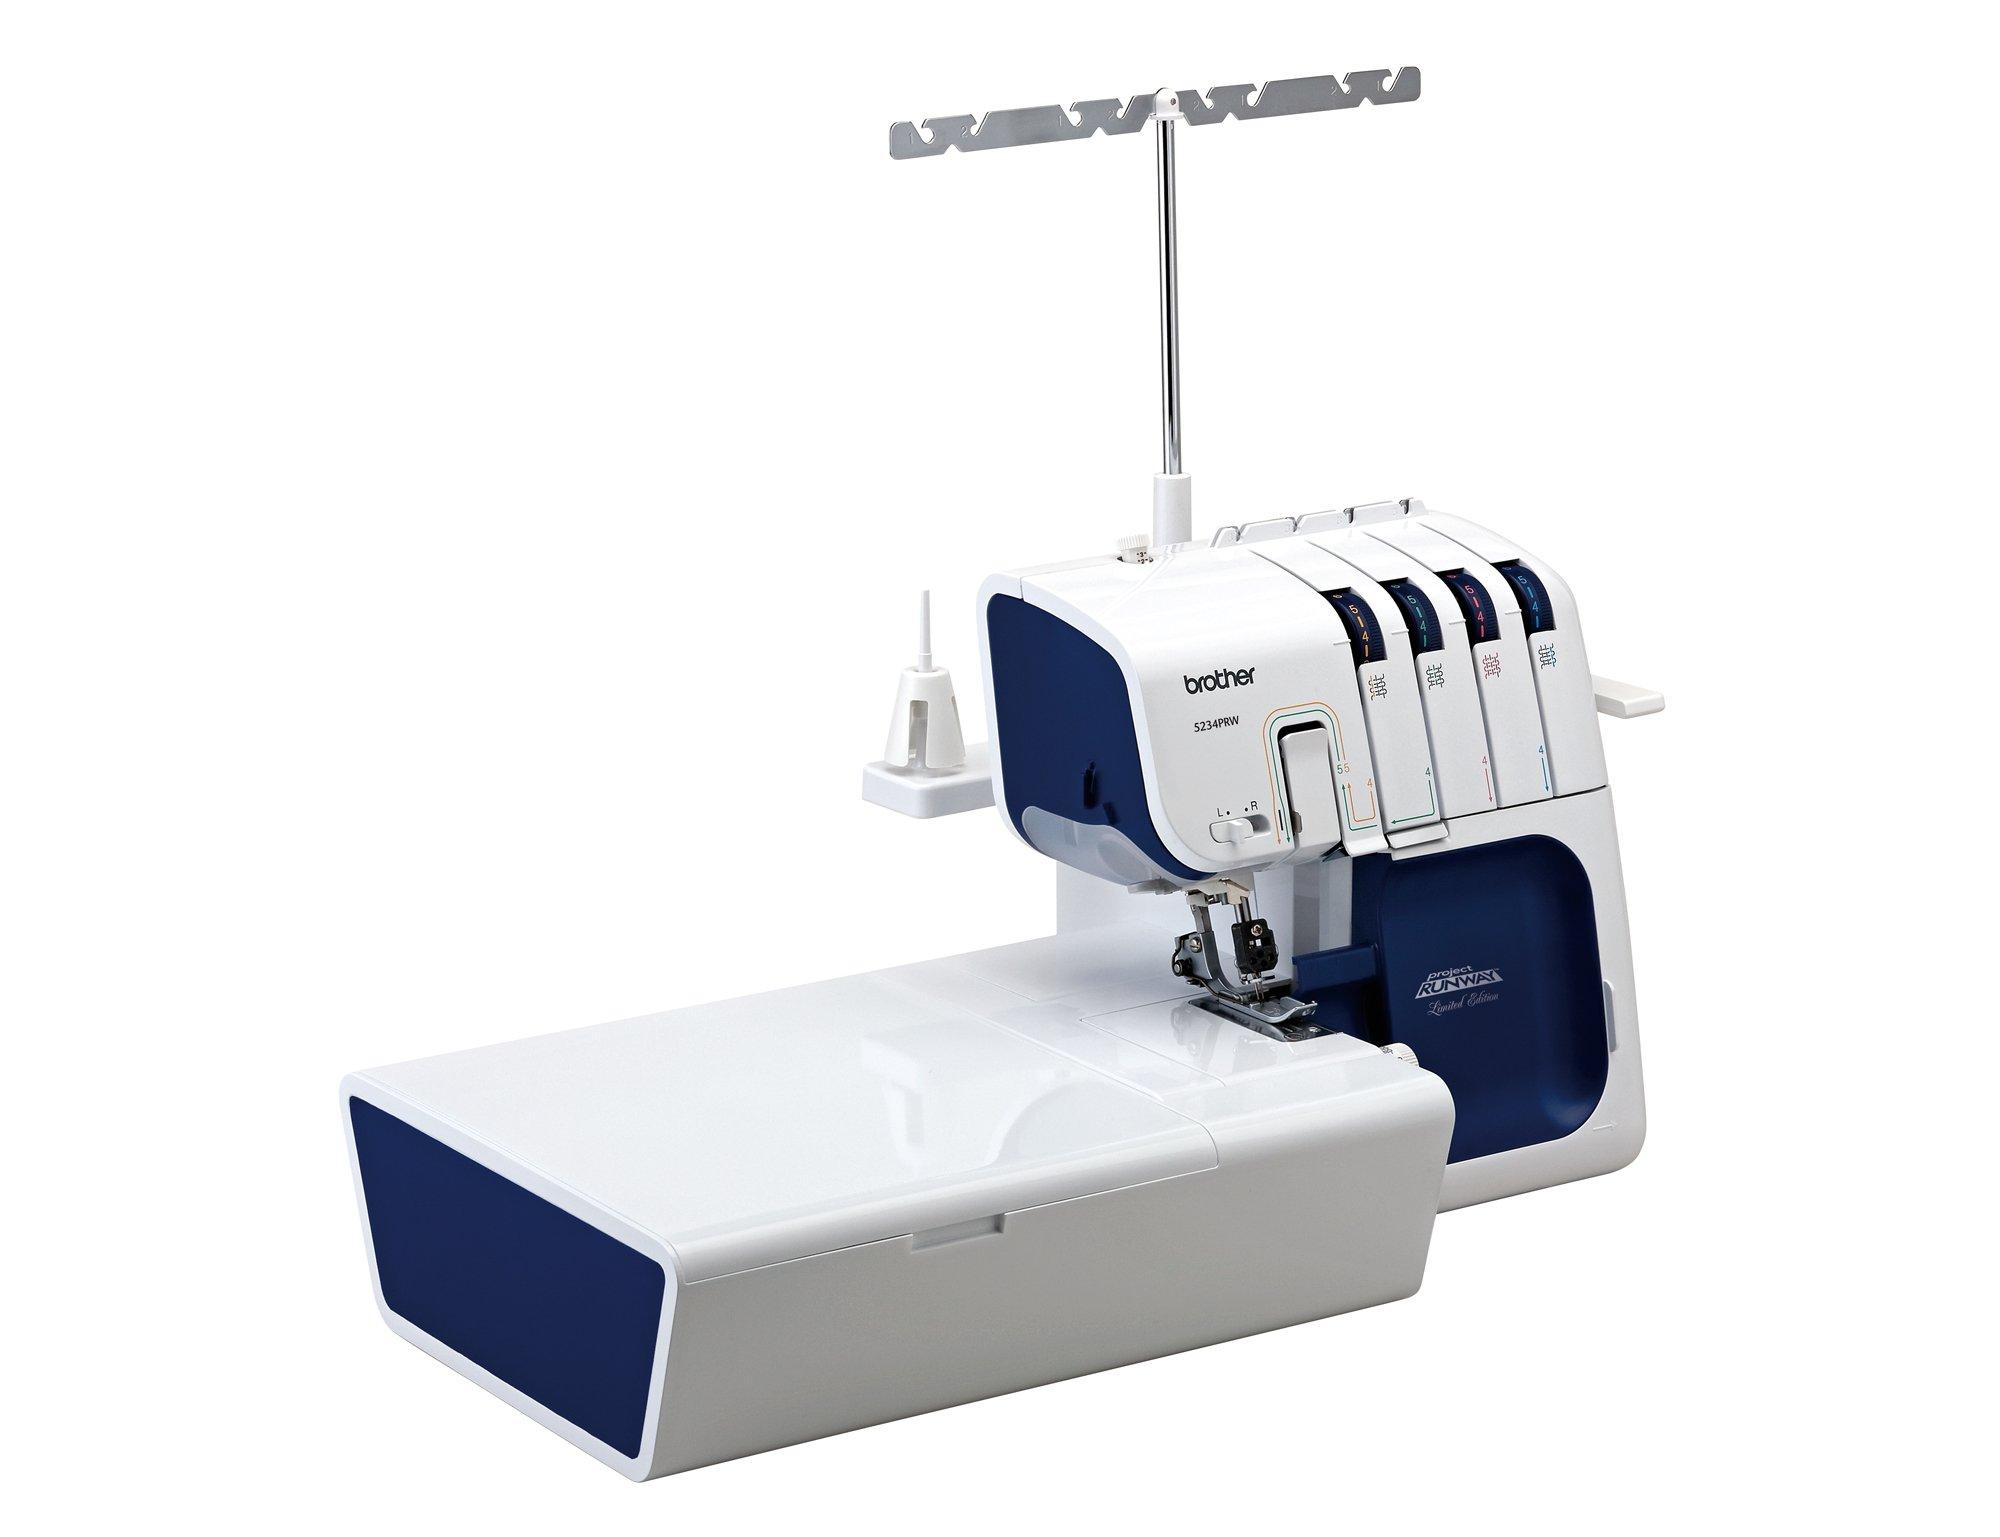 the machine 2 innov ã s xv8550d